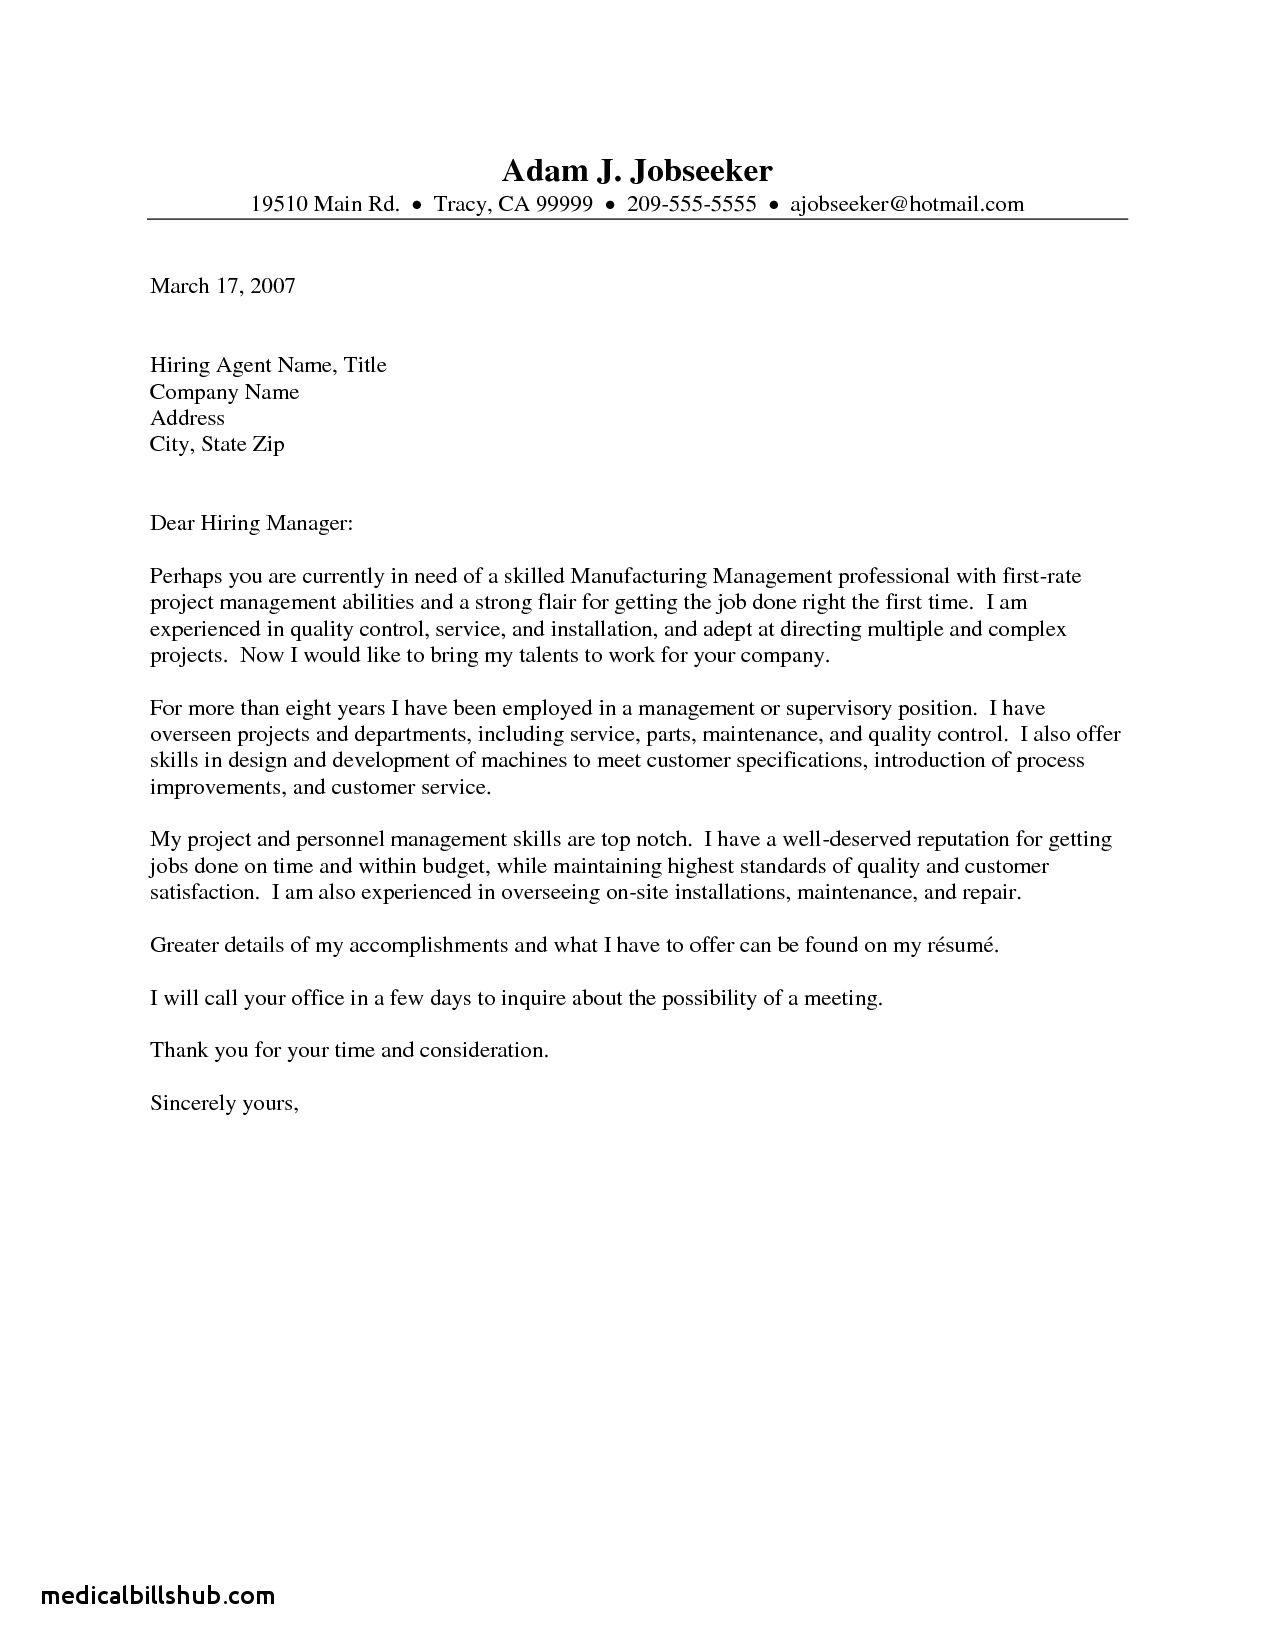 30+ Medical Assistant Cover Letter in 2020 Cover letter